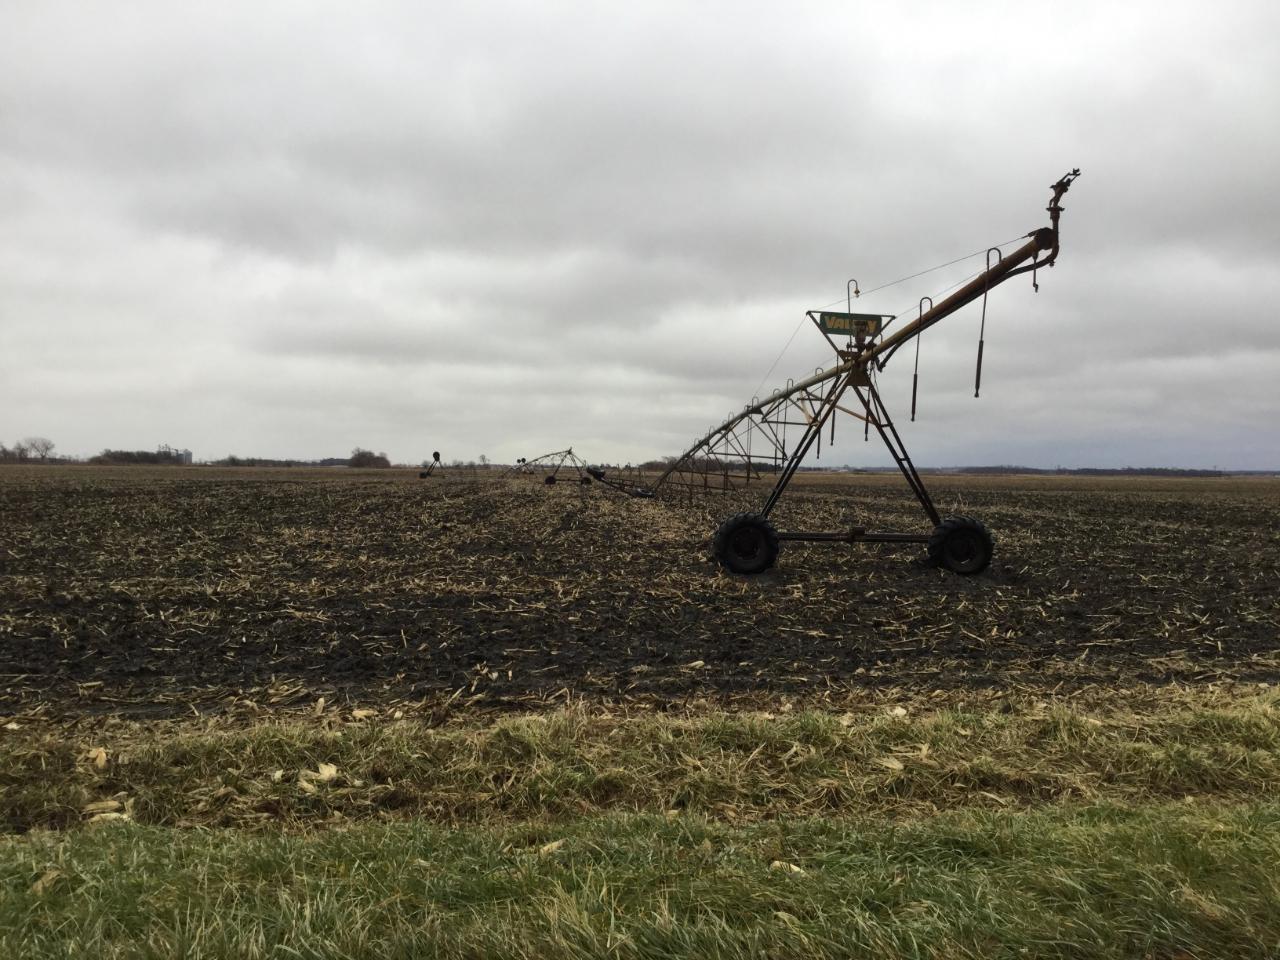 South of Topeka (NWS survey photo)